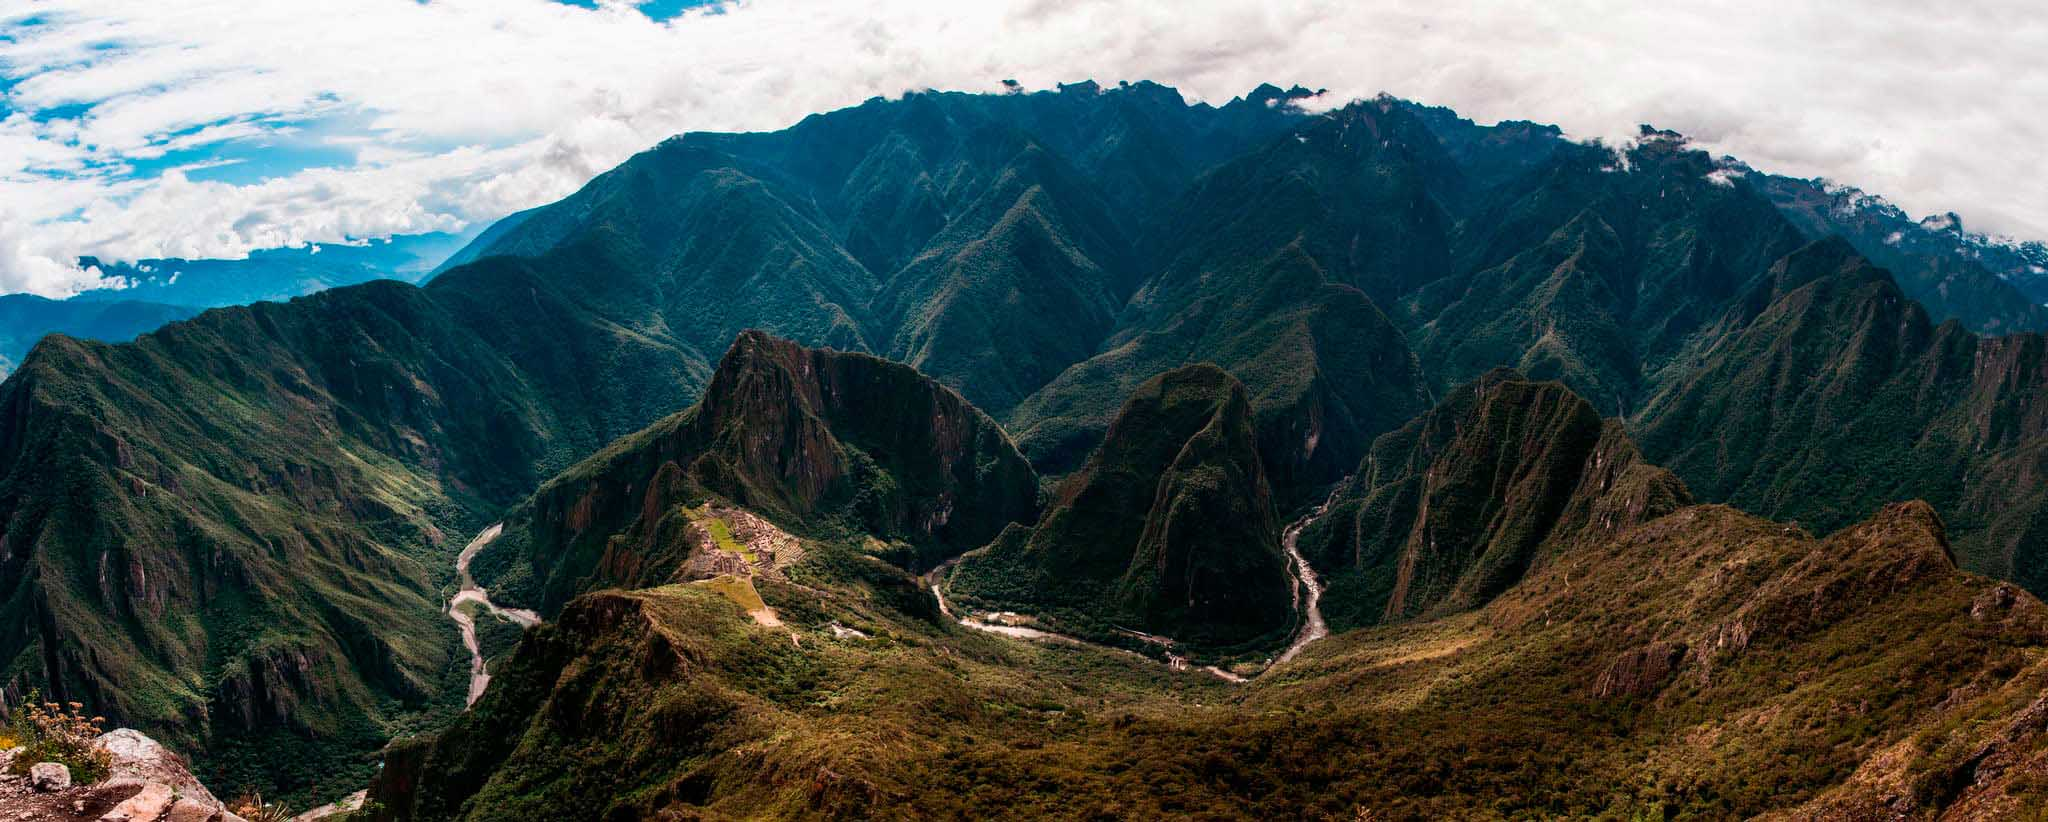 Machu-Picchu-Mountain-Ticket